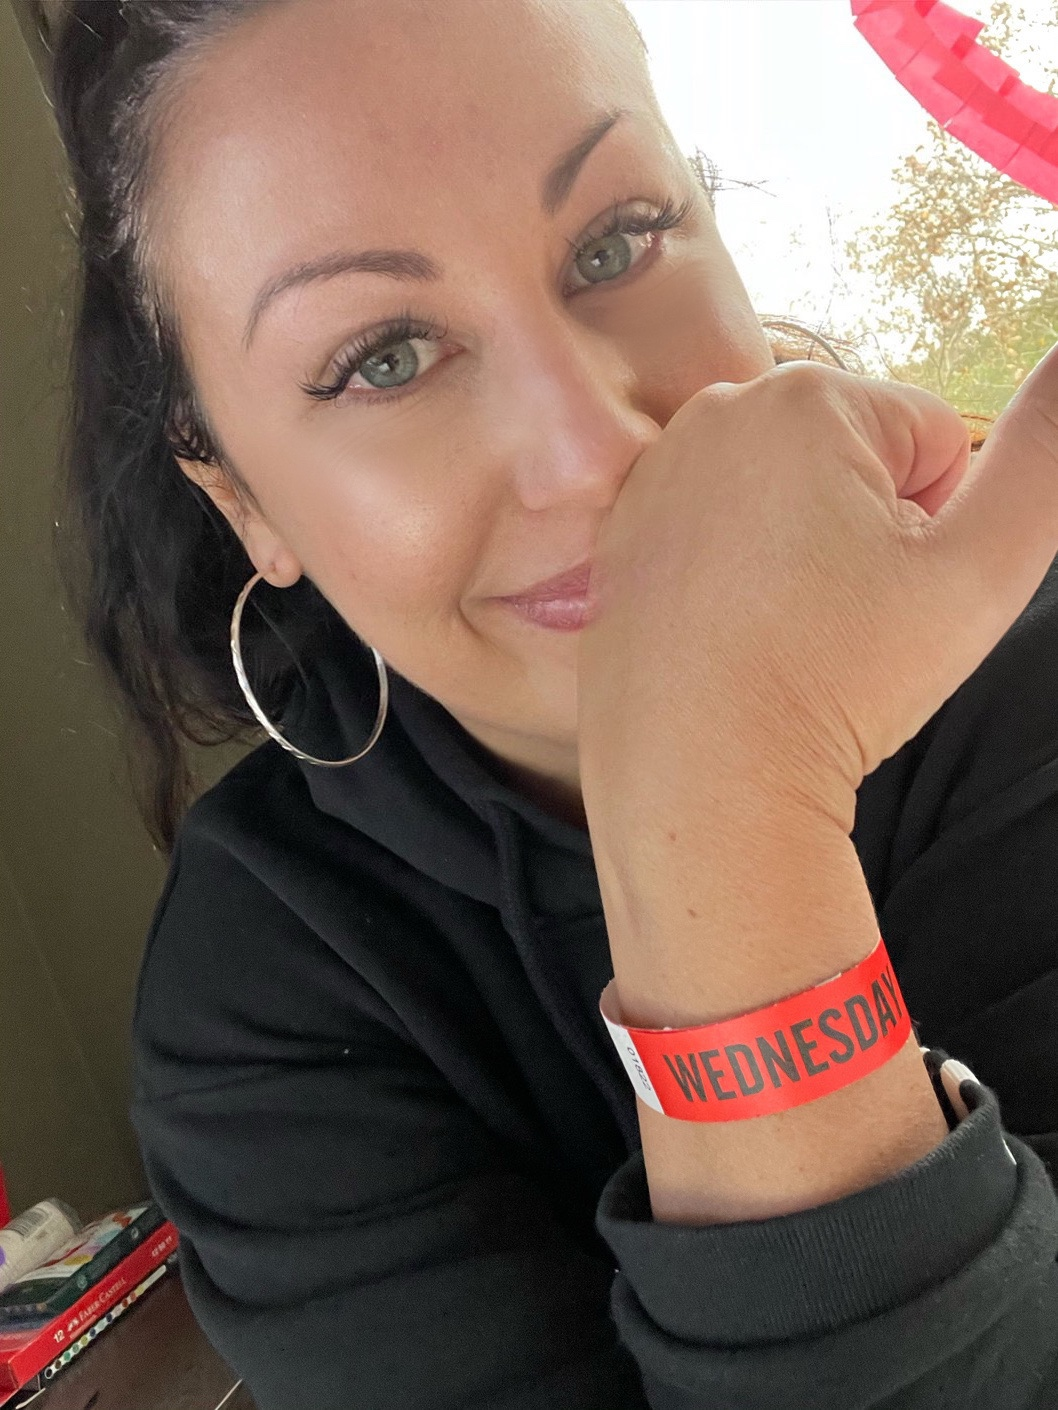 selfie of woman in hotel quarantine wearing release wrist band